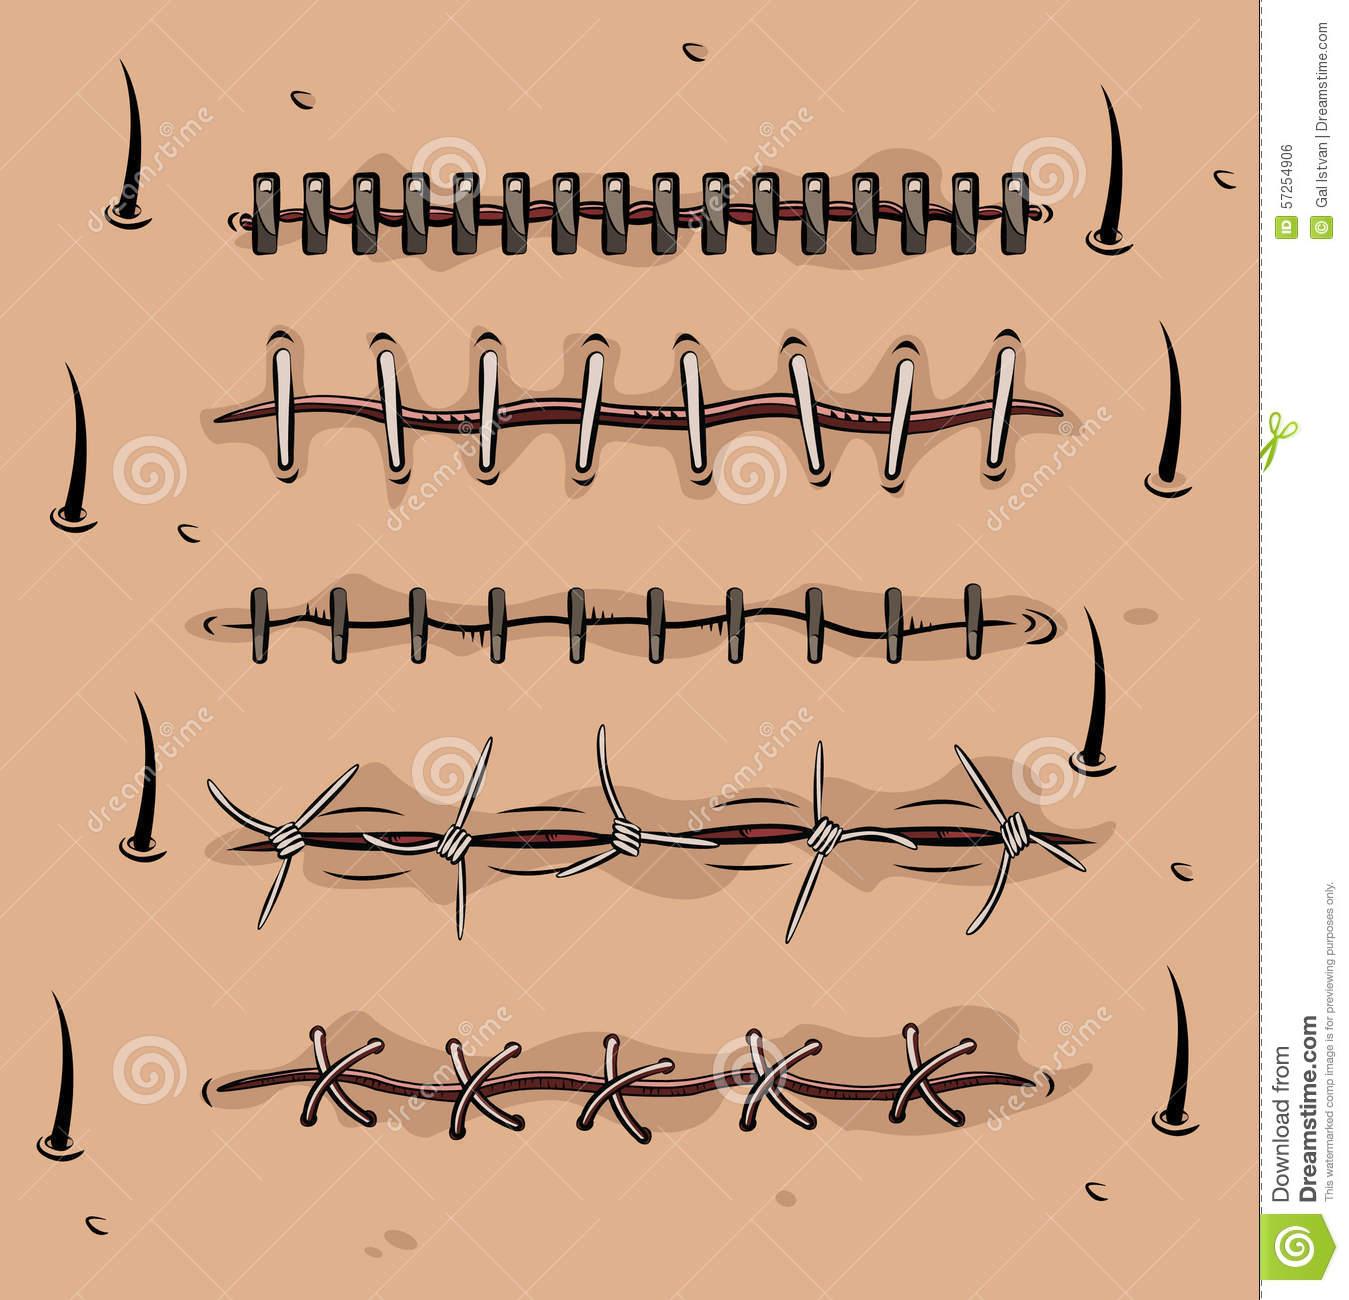 Scars Stock Illustrations.